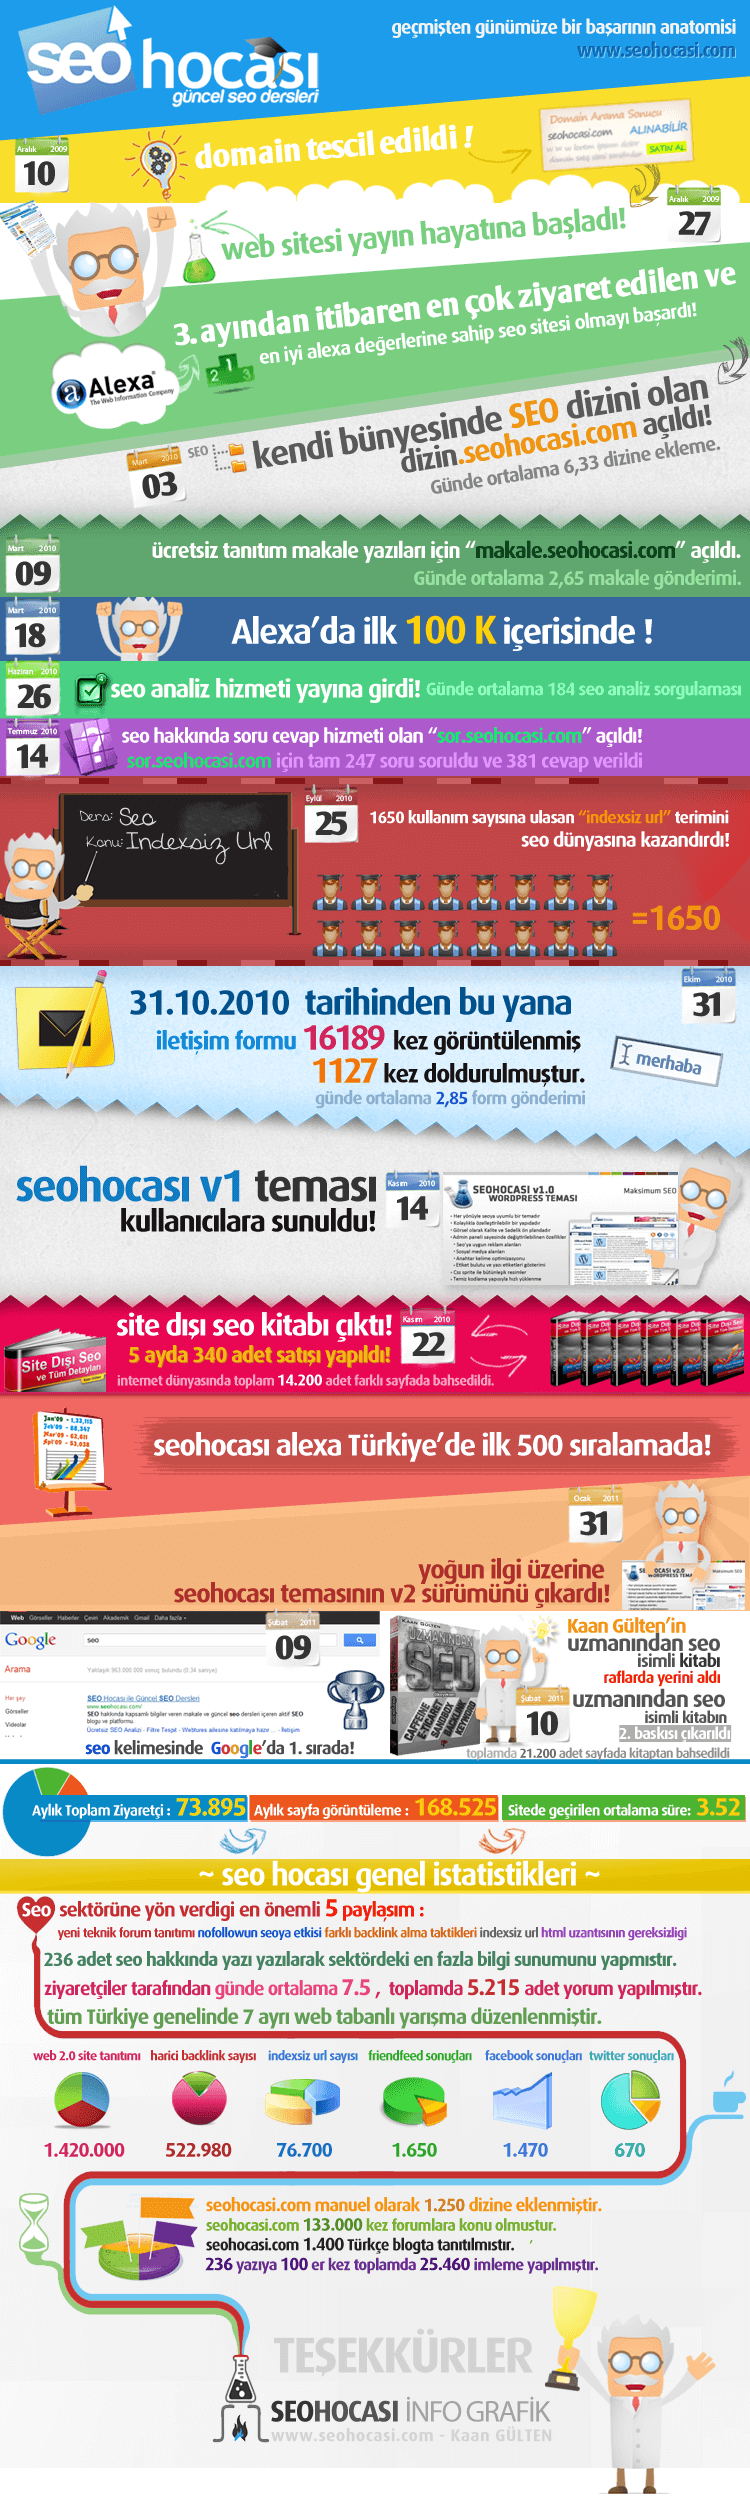 seo hocası infografik